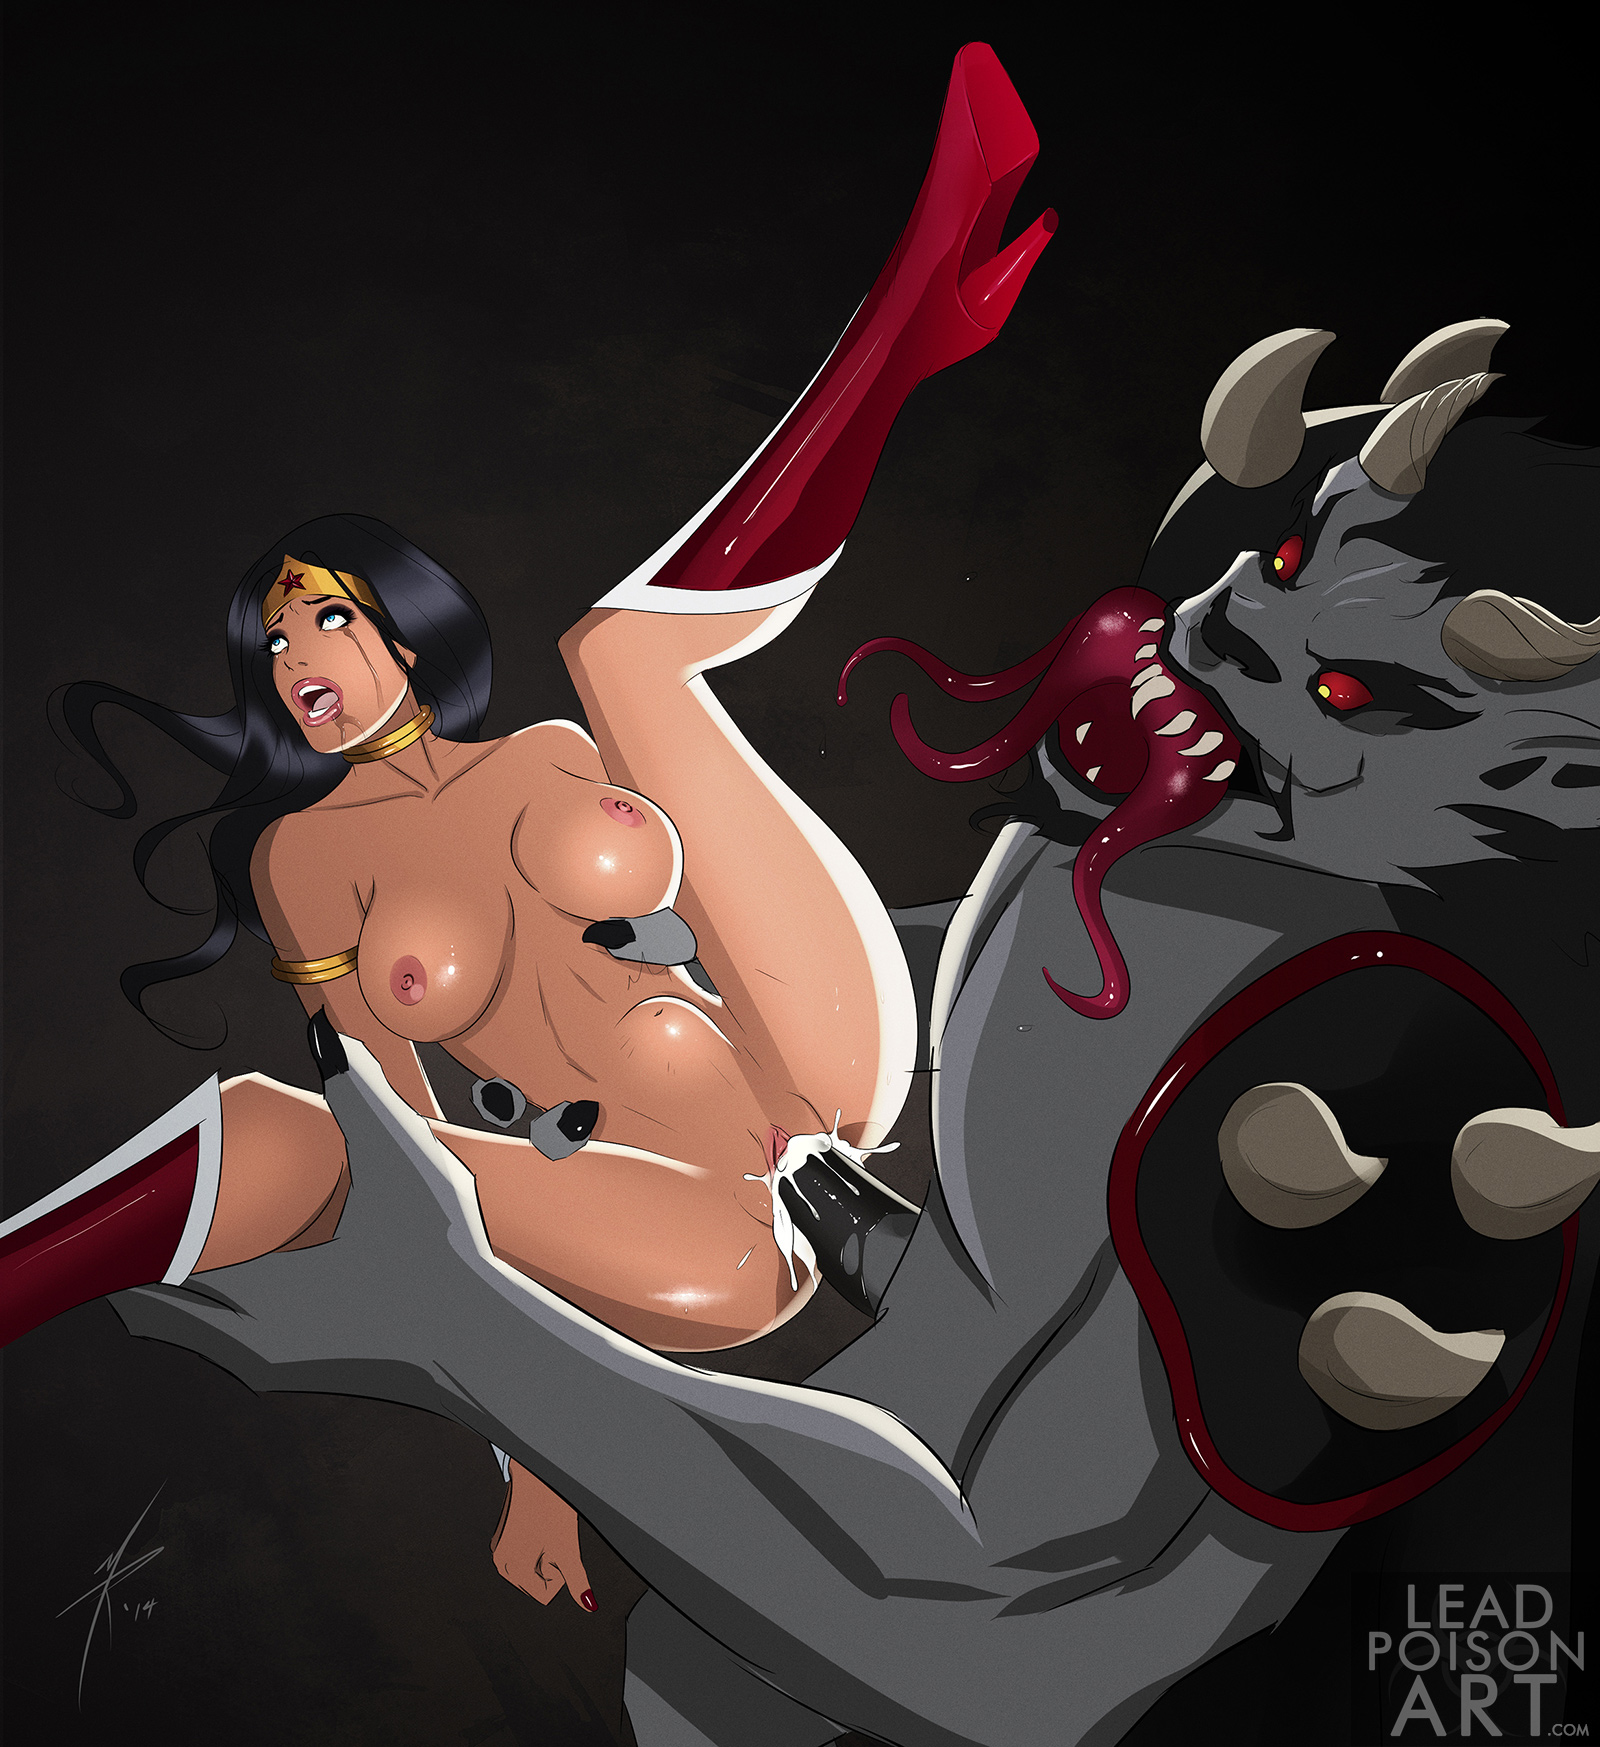 Female Superhero Hentai inside 711976: leadpoisonart - e621